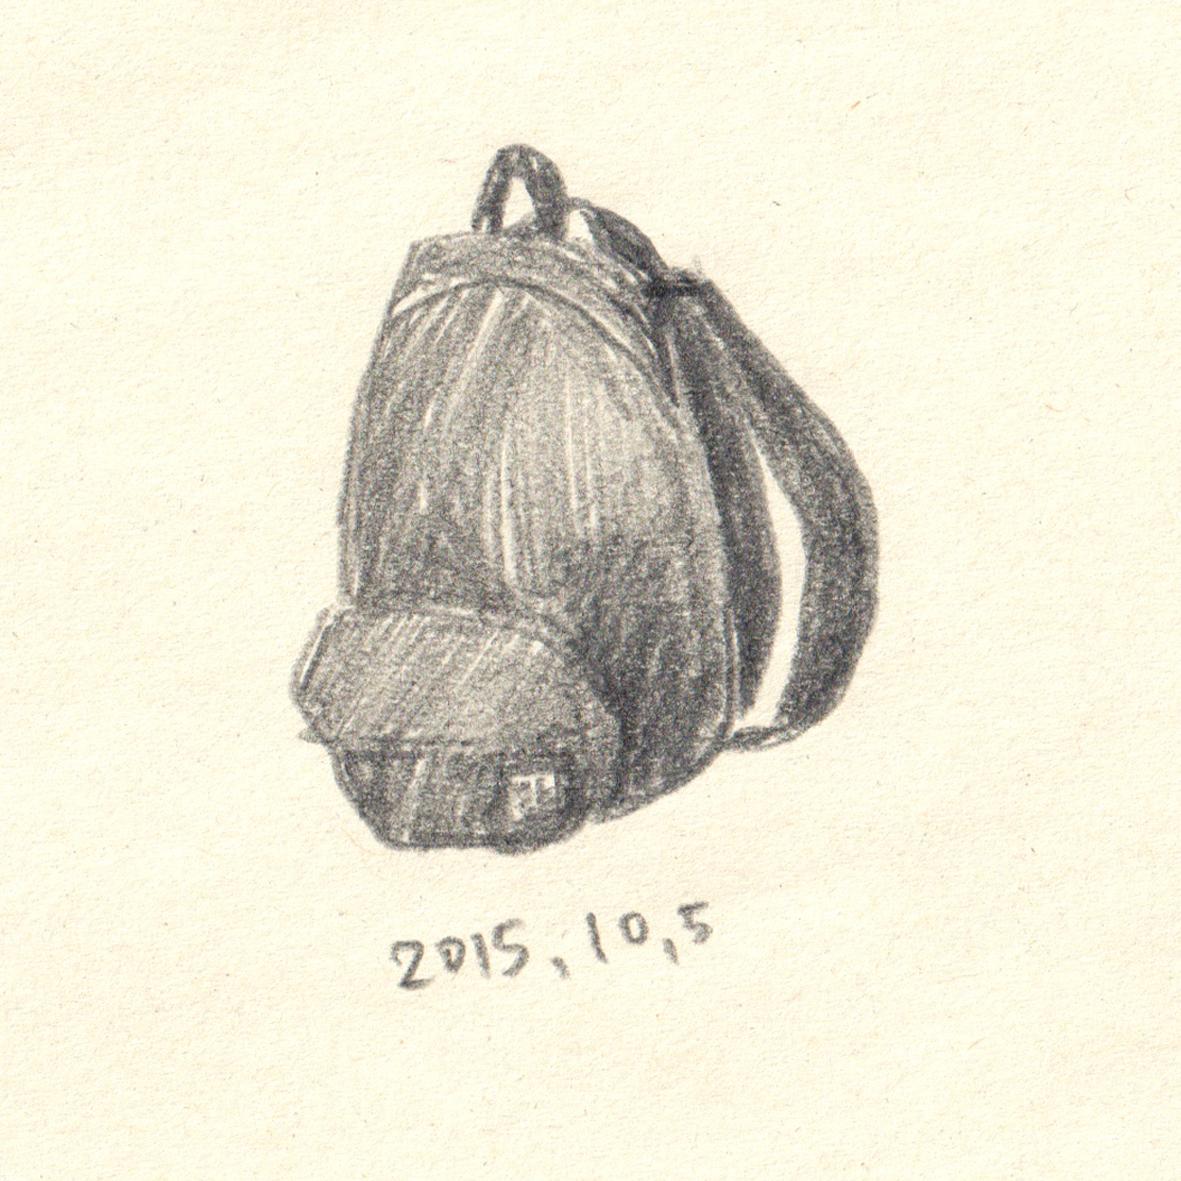 2015/10/5